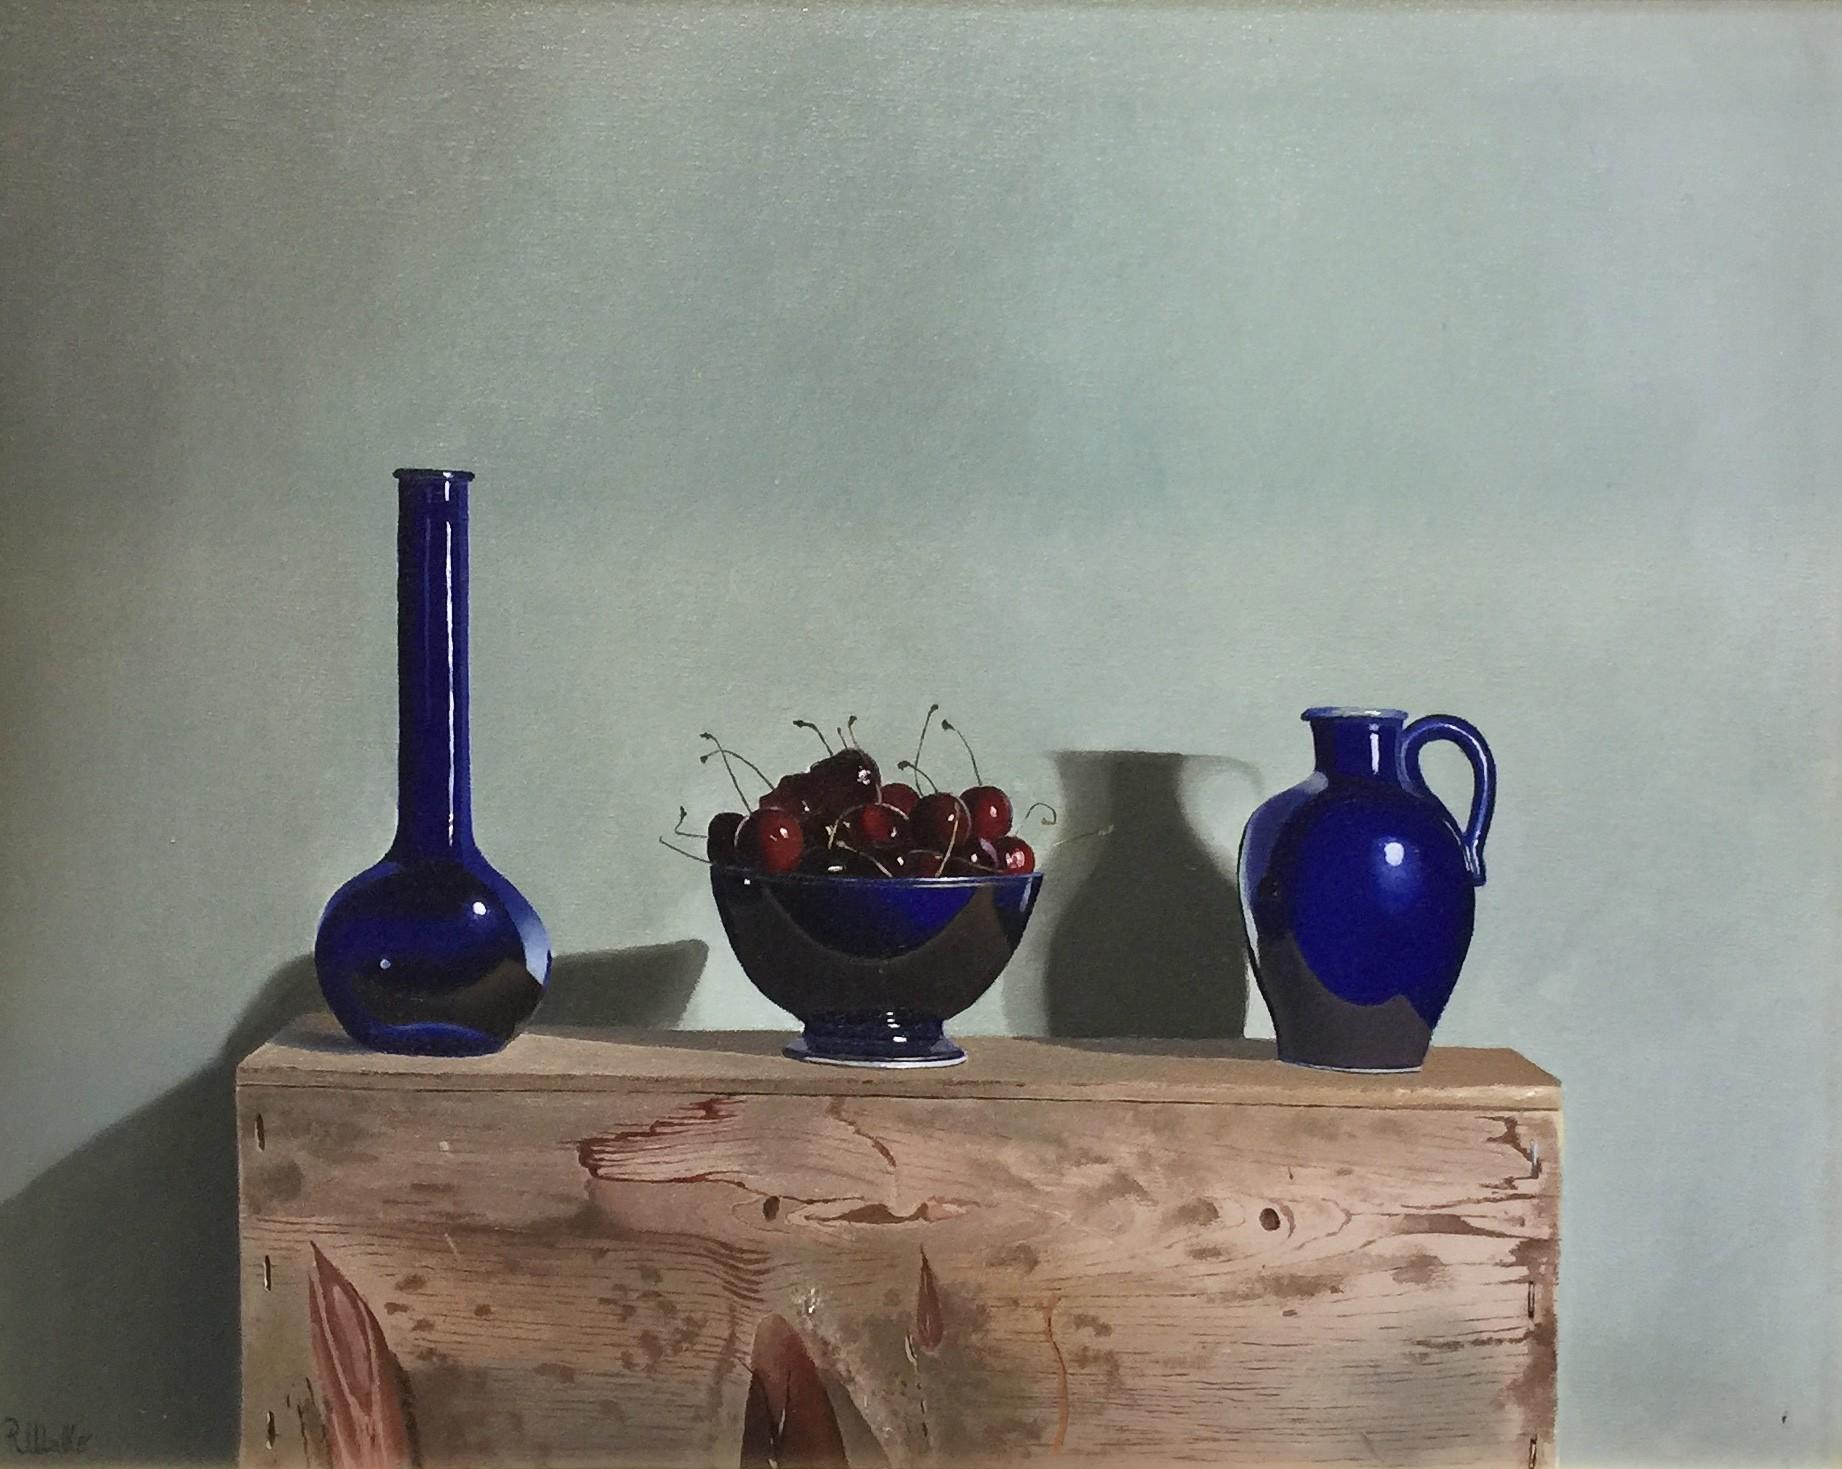 <span class=&#34;link fancybox-details-link&#34;><a href=&#34;/artists/67-robert-walker/works/618-robert-walker-blue-vase-with-cherries/&#34;>View Detail Page</a></span><div class=&#34;artist&#34;><strong>Robert Walker</strong></div> <div class=&#34;title&#34;><em>Blue Vase with Cherries</em></div> <div class=&#34;medium&#34;>Oil on Linen </div> <div class=&#34;dimensions&#34;>42 x 52 cm  </div>